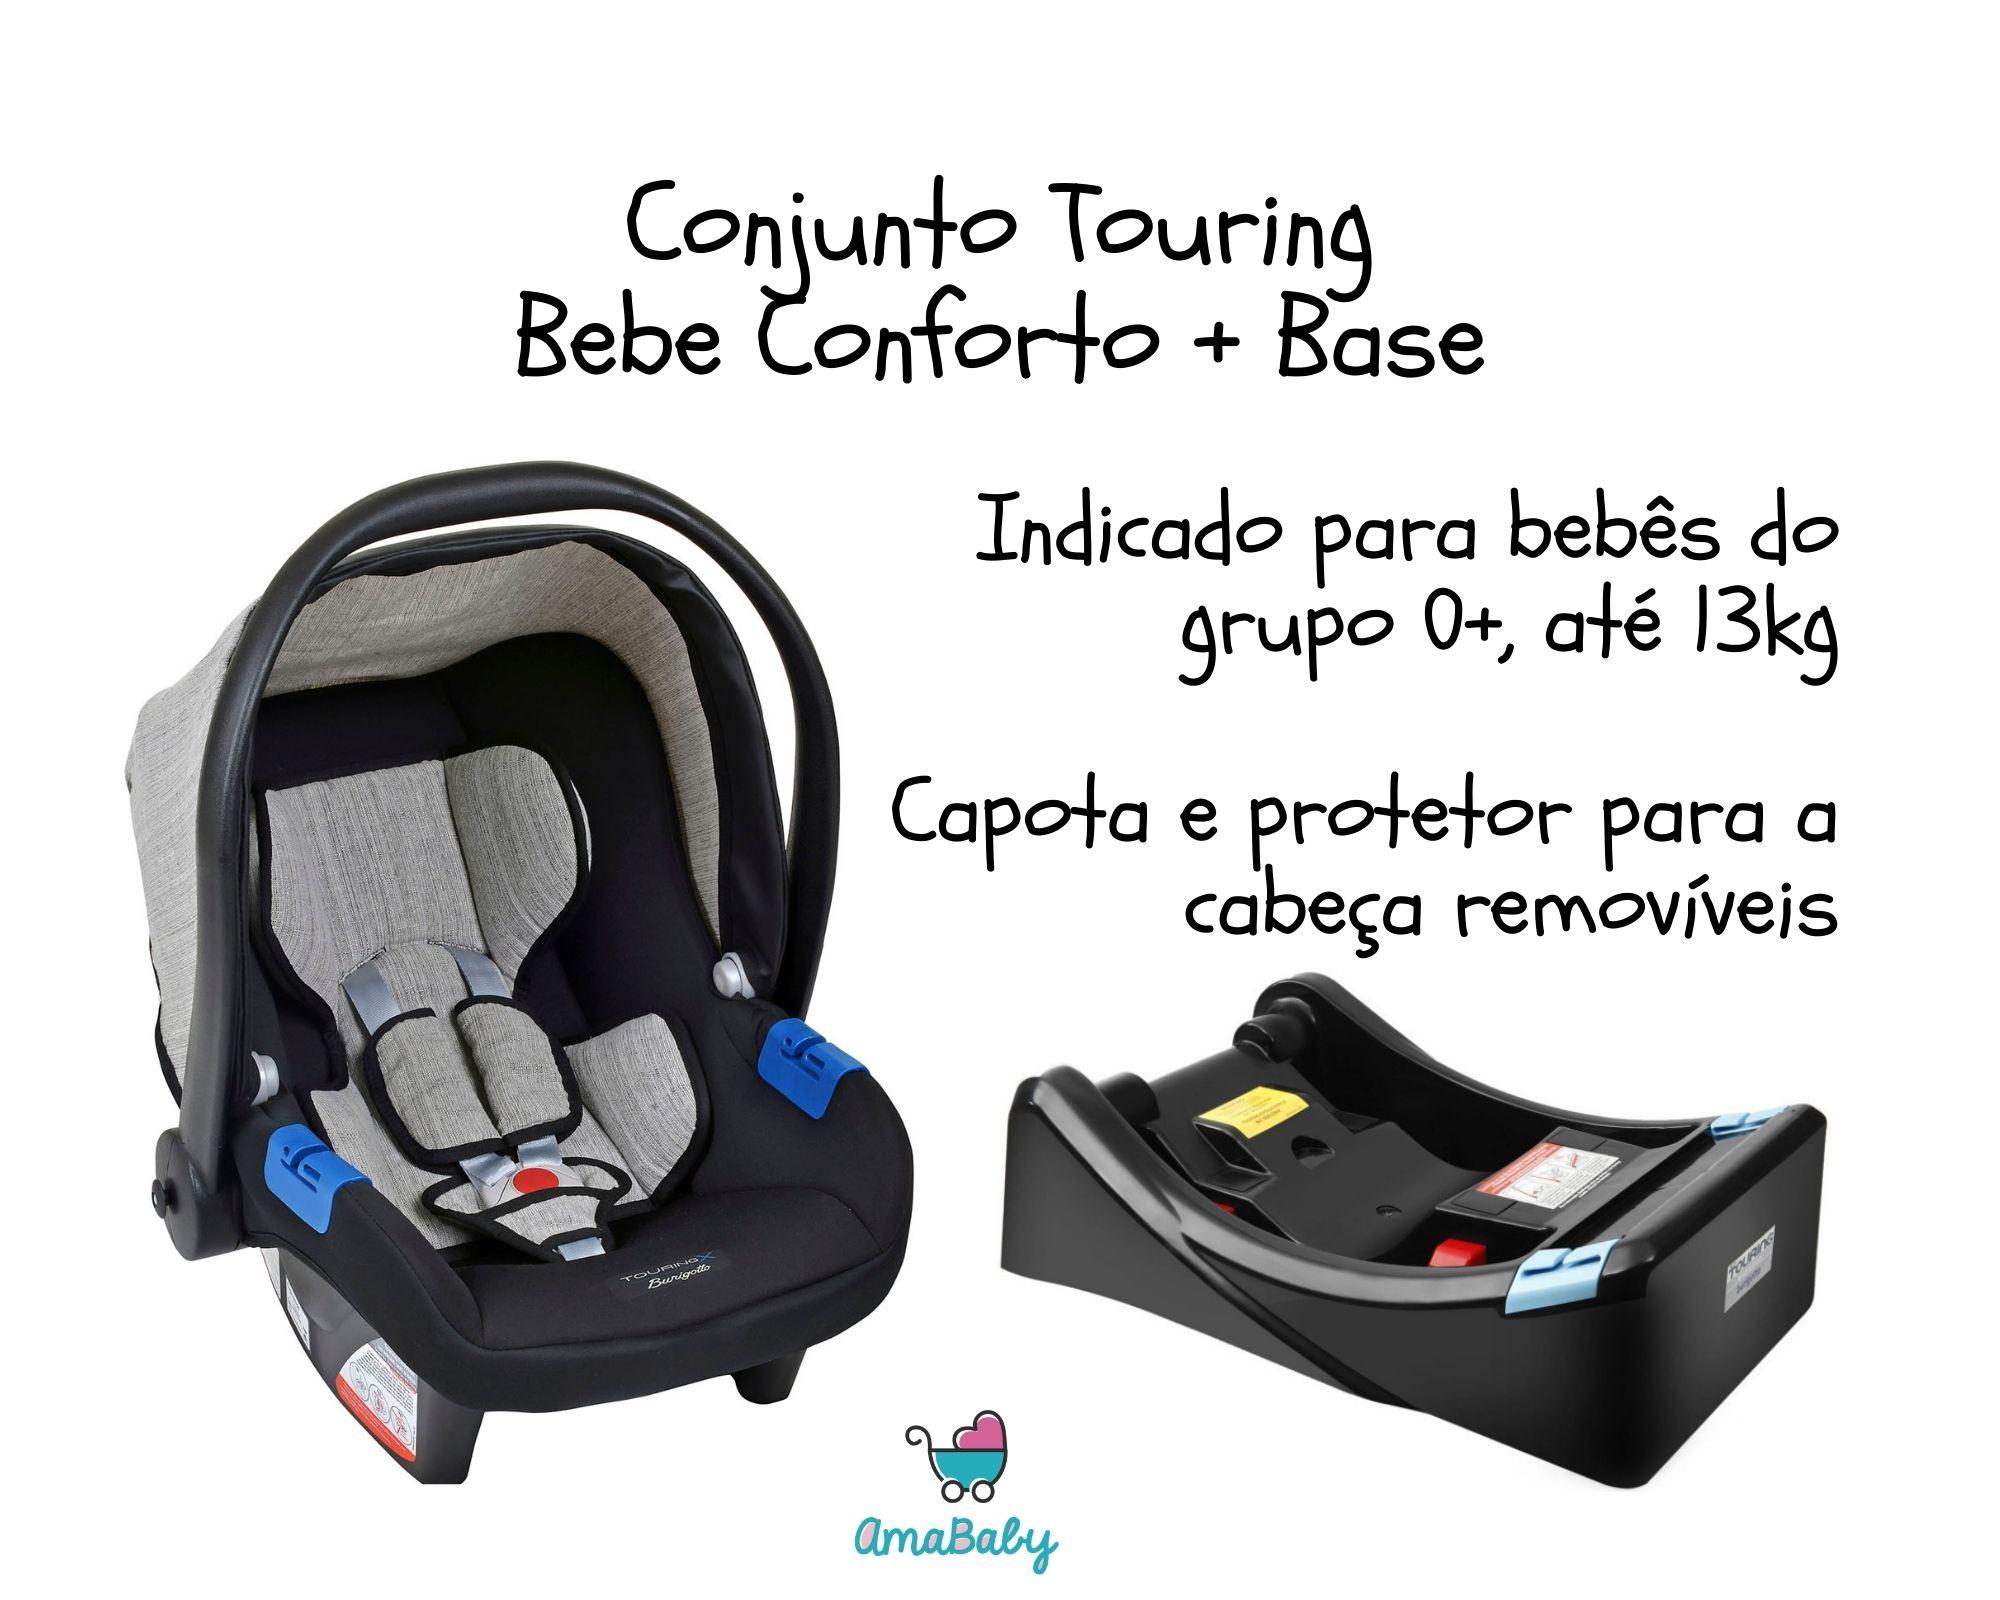 Kit Bebe Conforto Touring Gray e Base Touring Burigotto